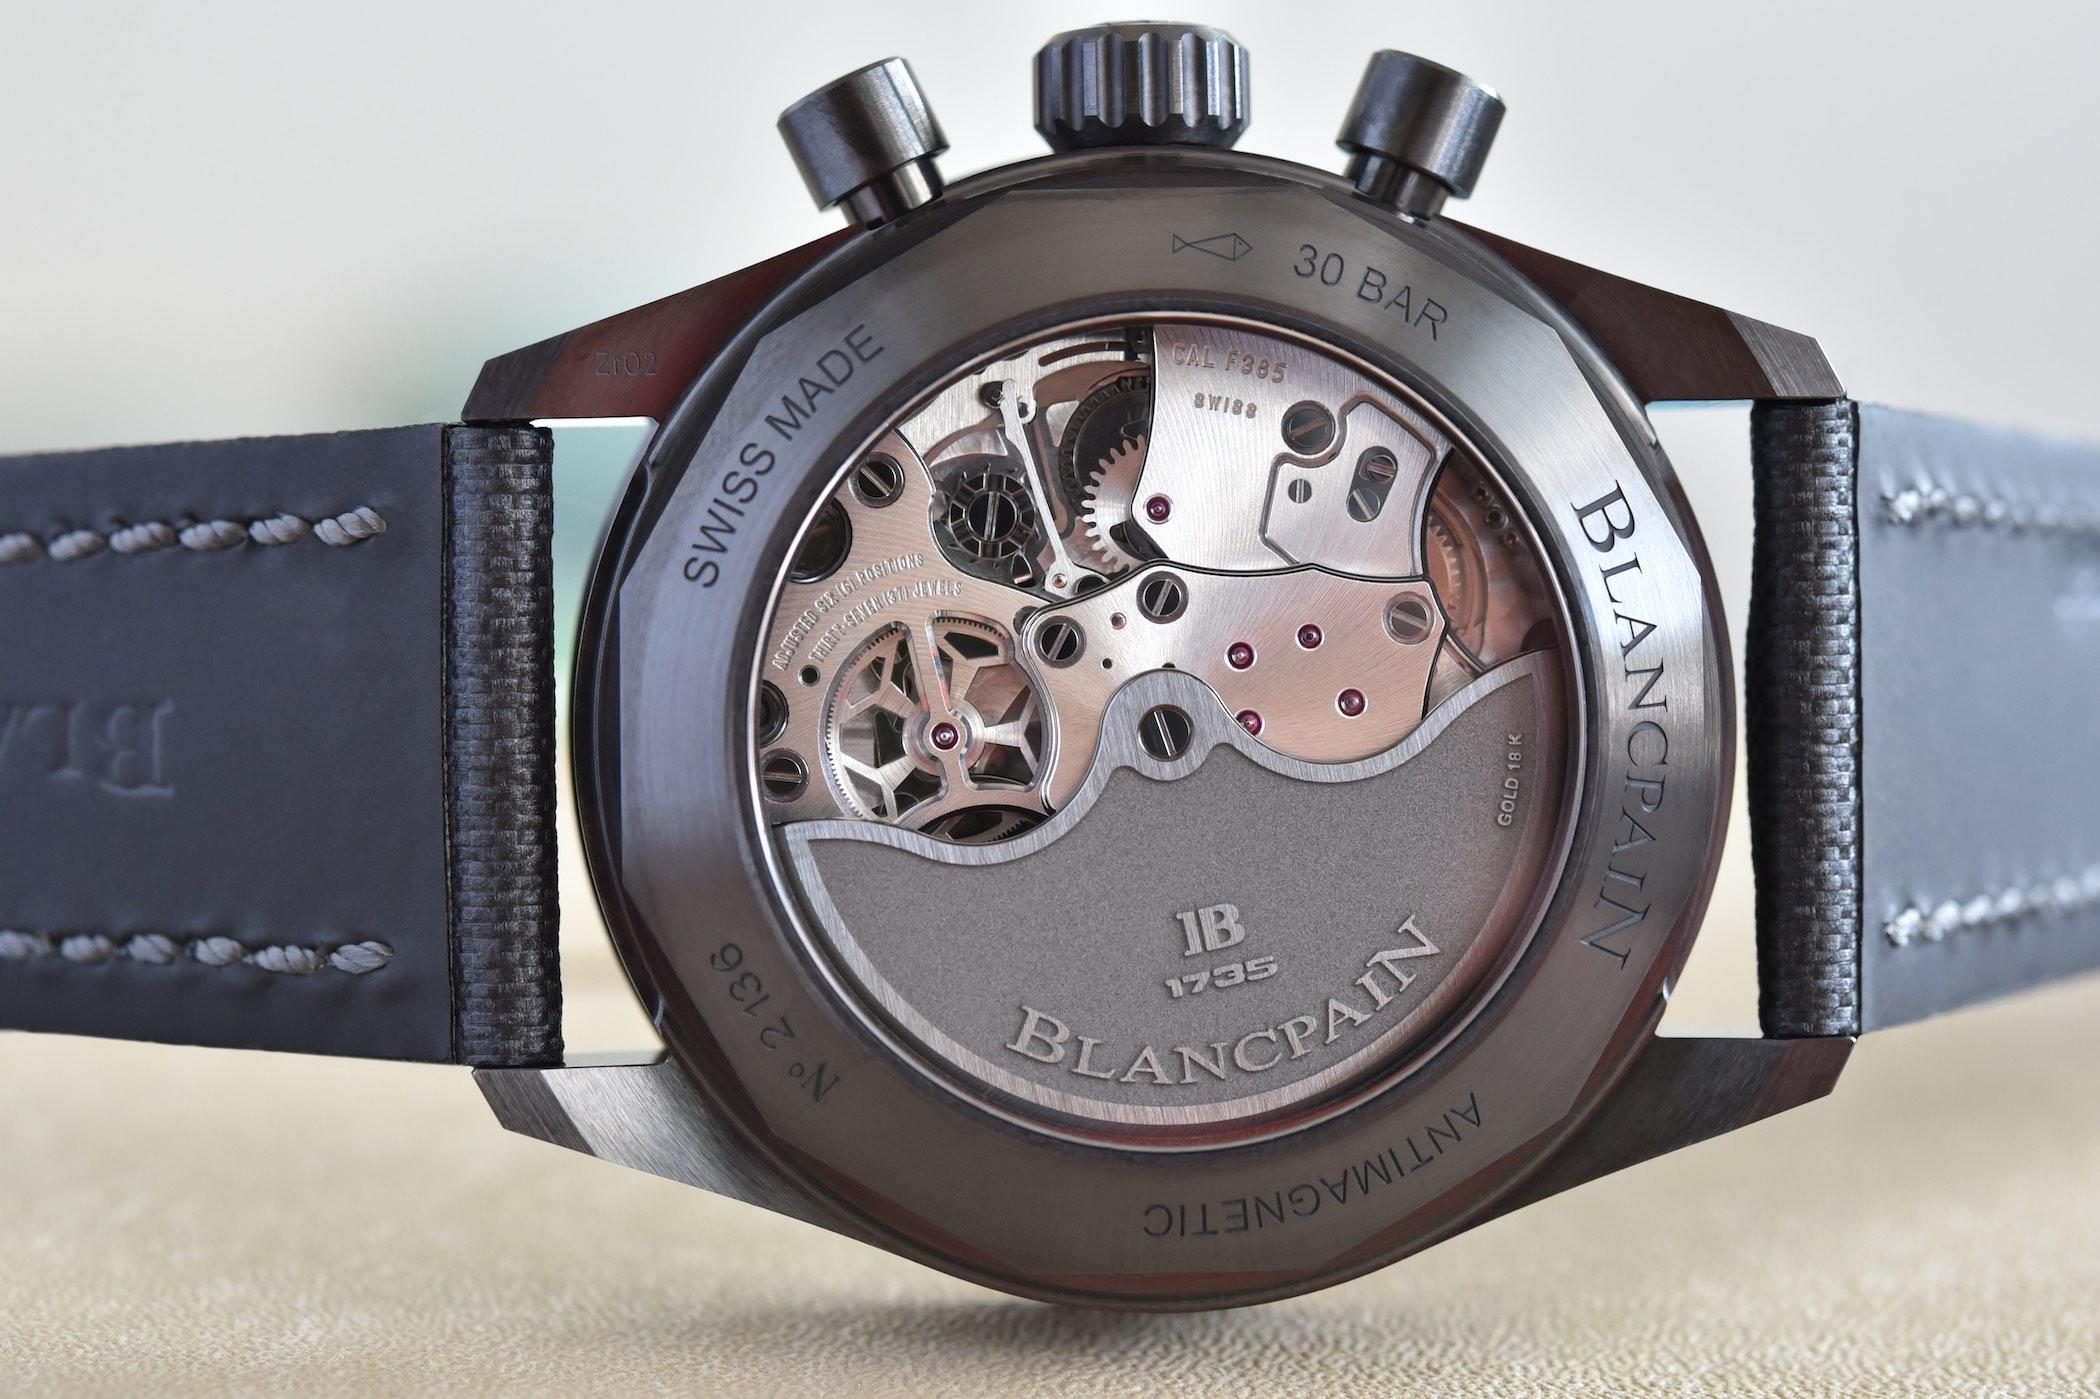 Blancpain Bathyscaphe Chronograph Flyback Green - Black Ceramic Green dial bezel 5200-0153-B52A - 8